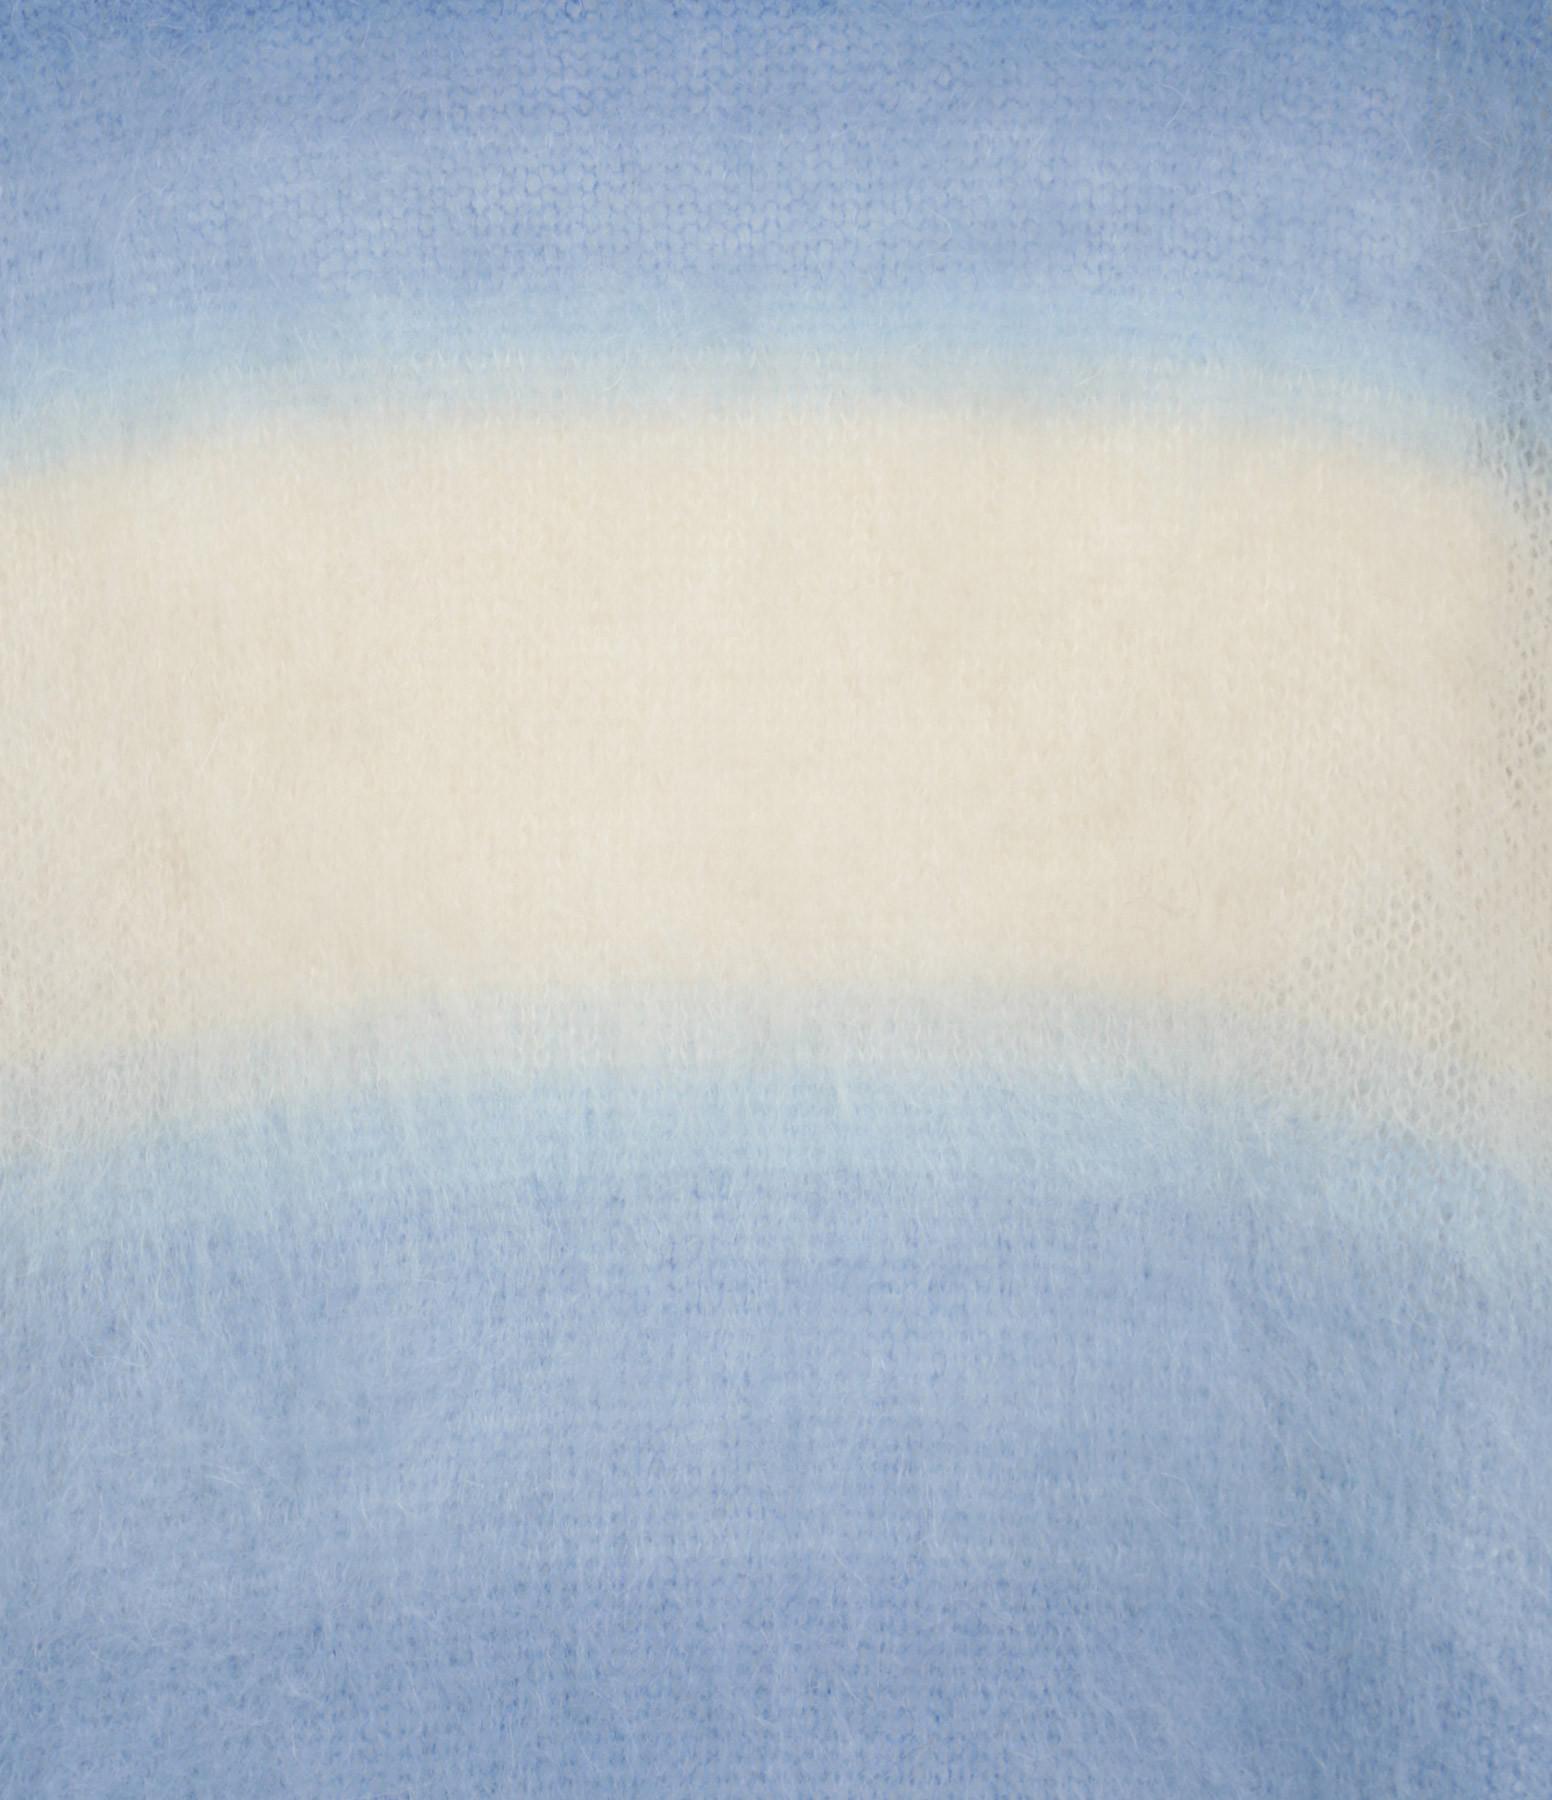 ISABEL MARANT ÉTOILE - Pull Drussell Mohair Bleu